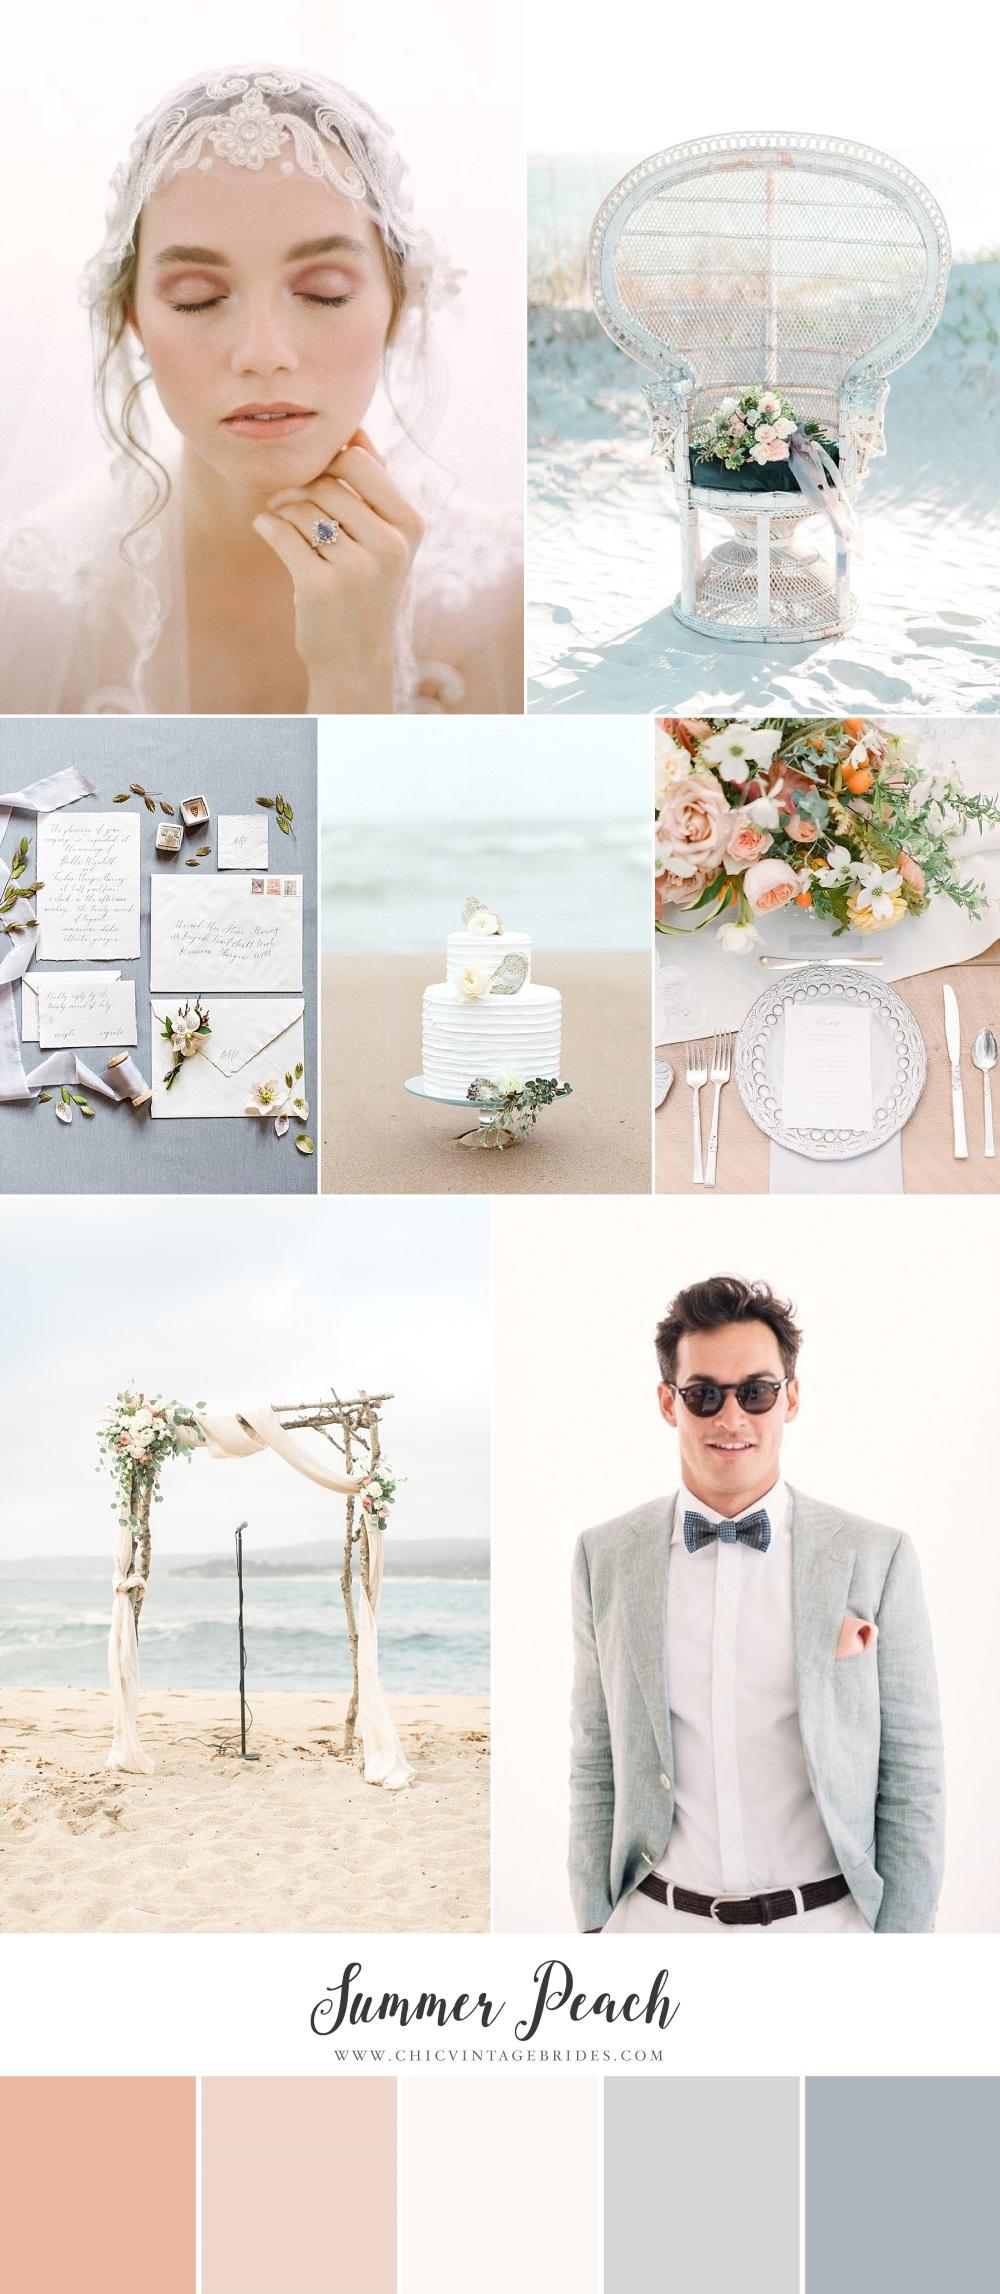 Summer Peach Beach Wedding Inspiration Board